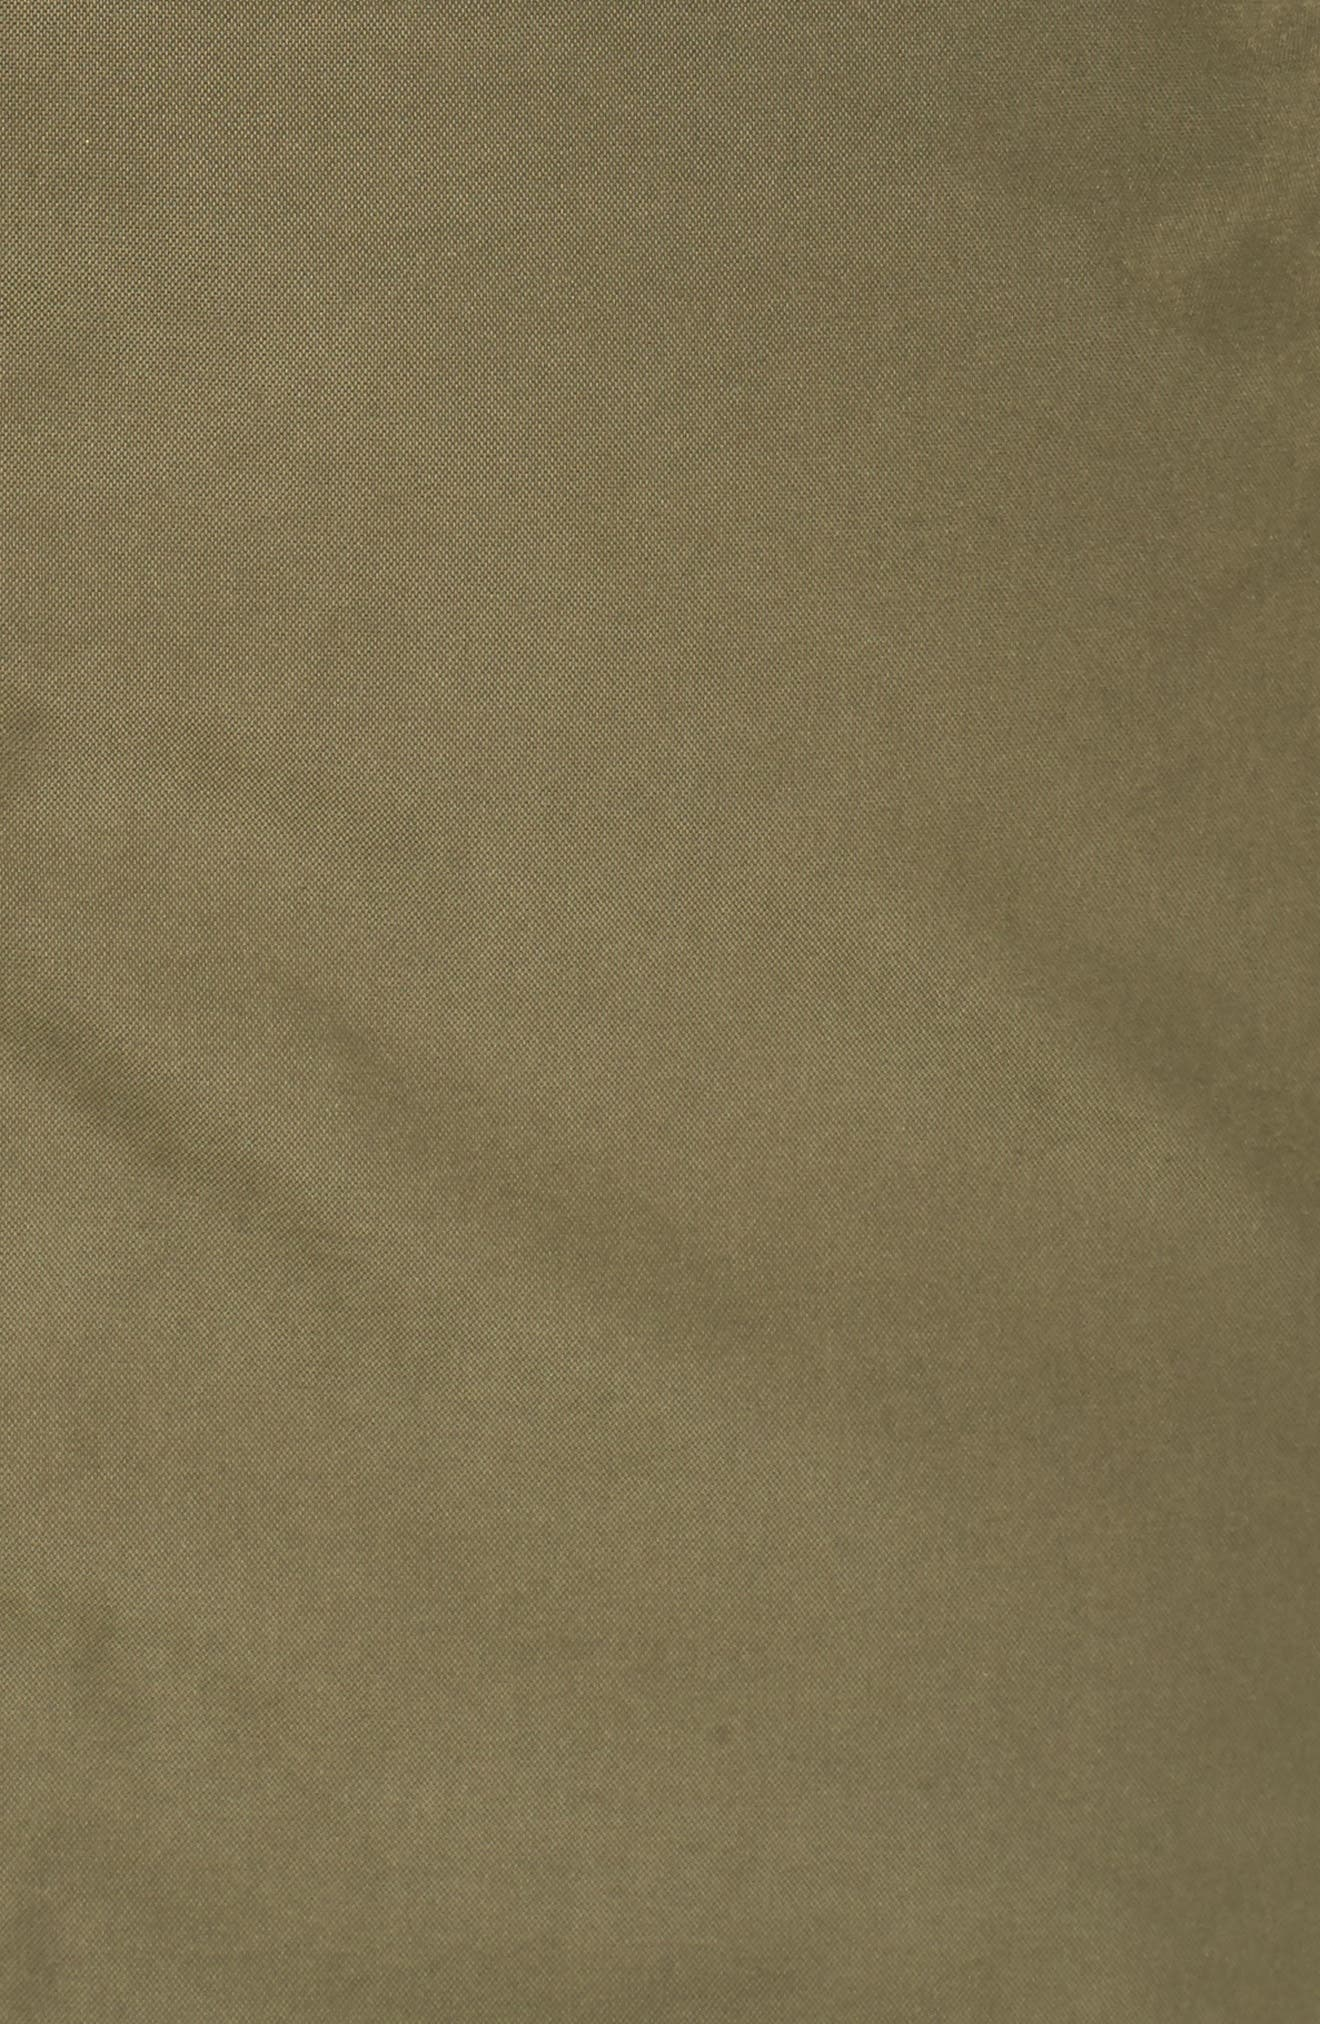 Heavenly Down Jacket,                             Alternate thumbnail 6, color,                             Burnt Olive Green